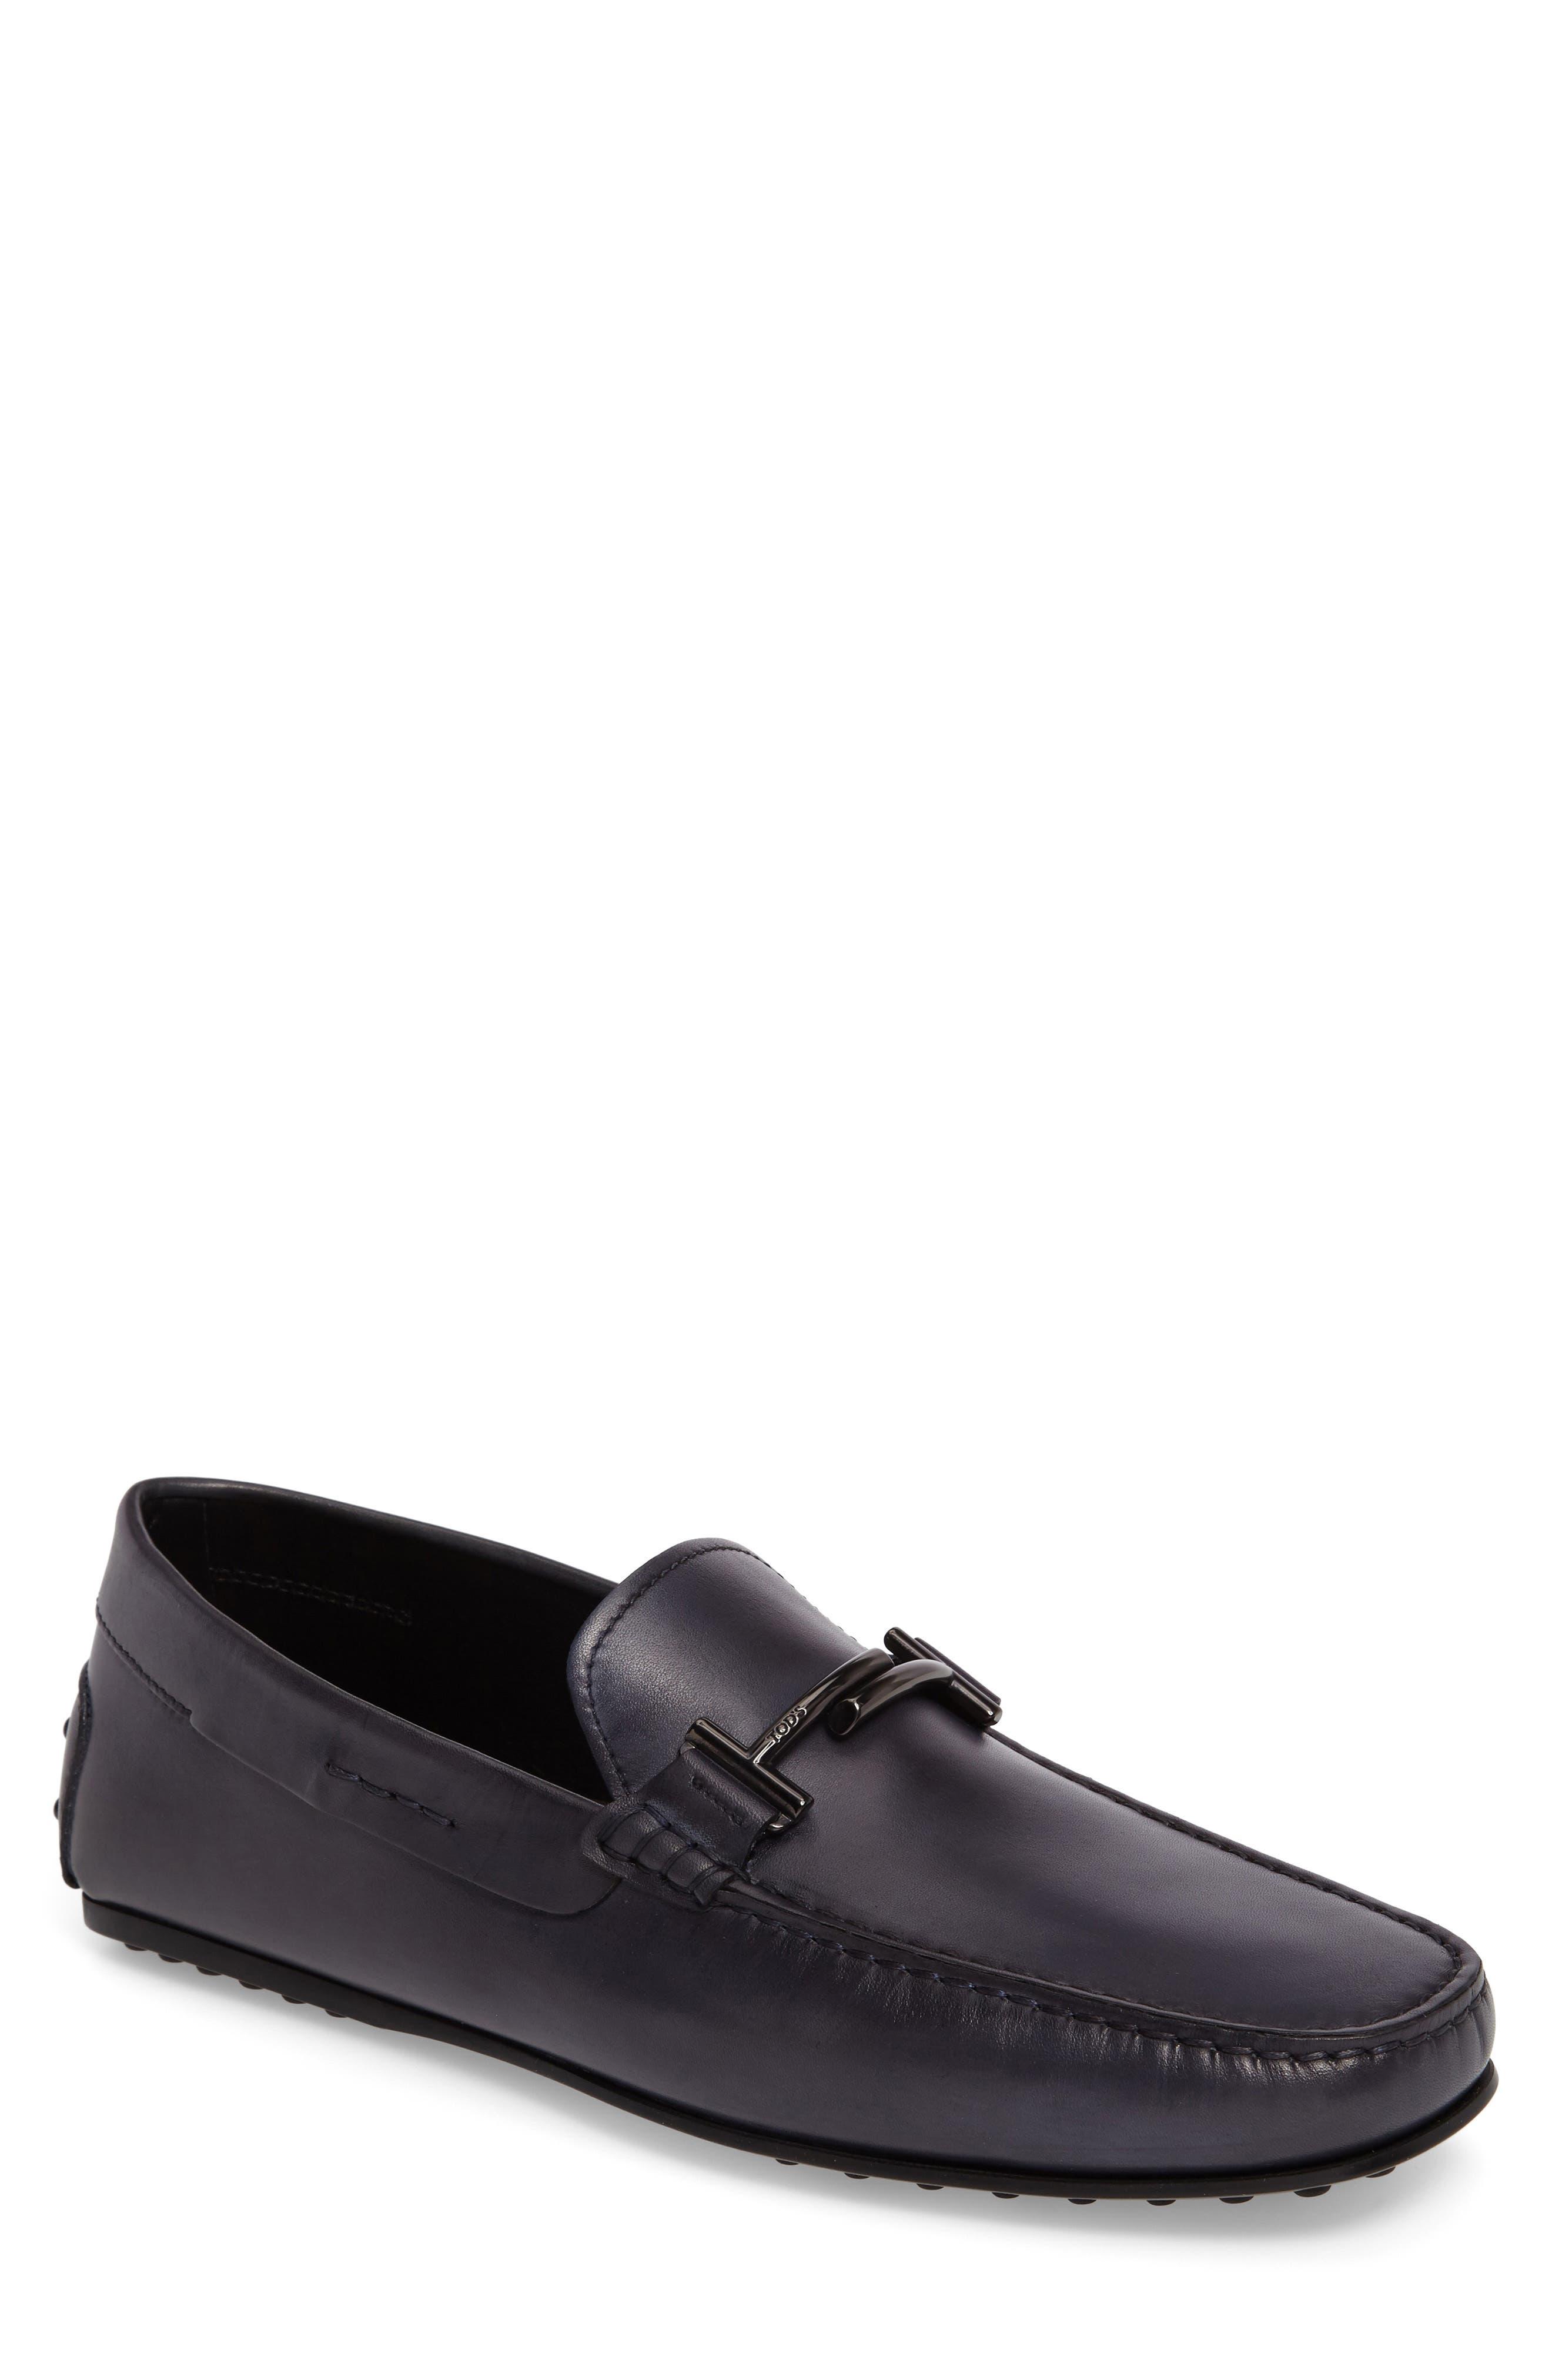 Gommini Driving Shoe,                         Main,                         color, Dark Grey Leather